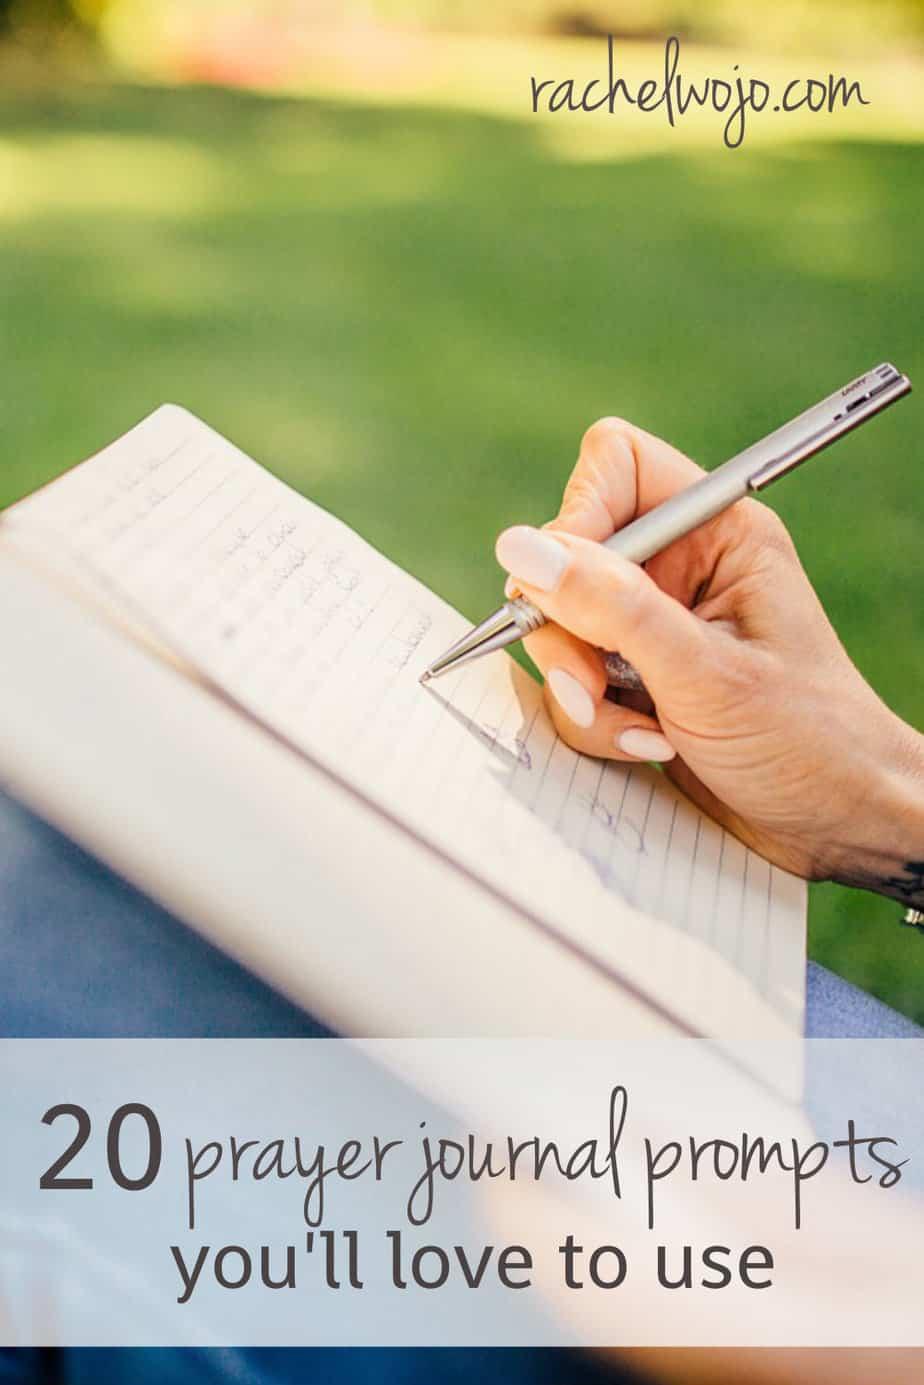 20 prayer journal prompts - rachelwojo